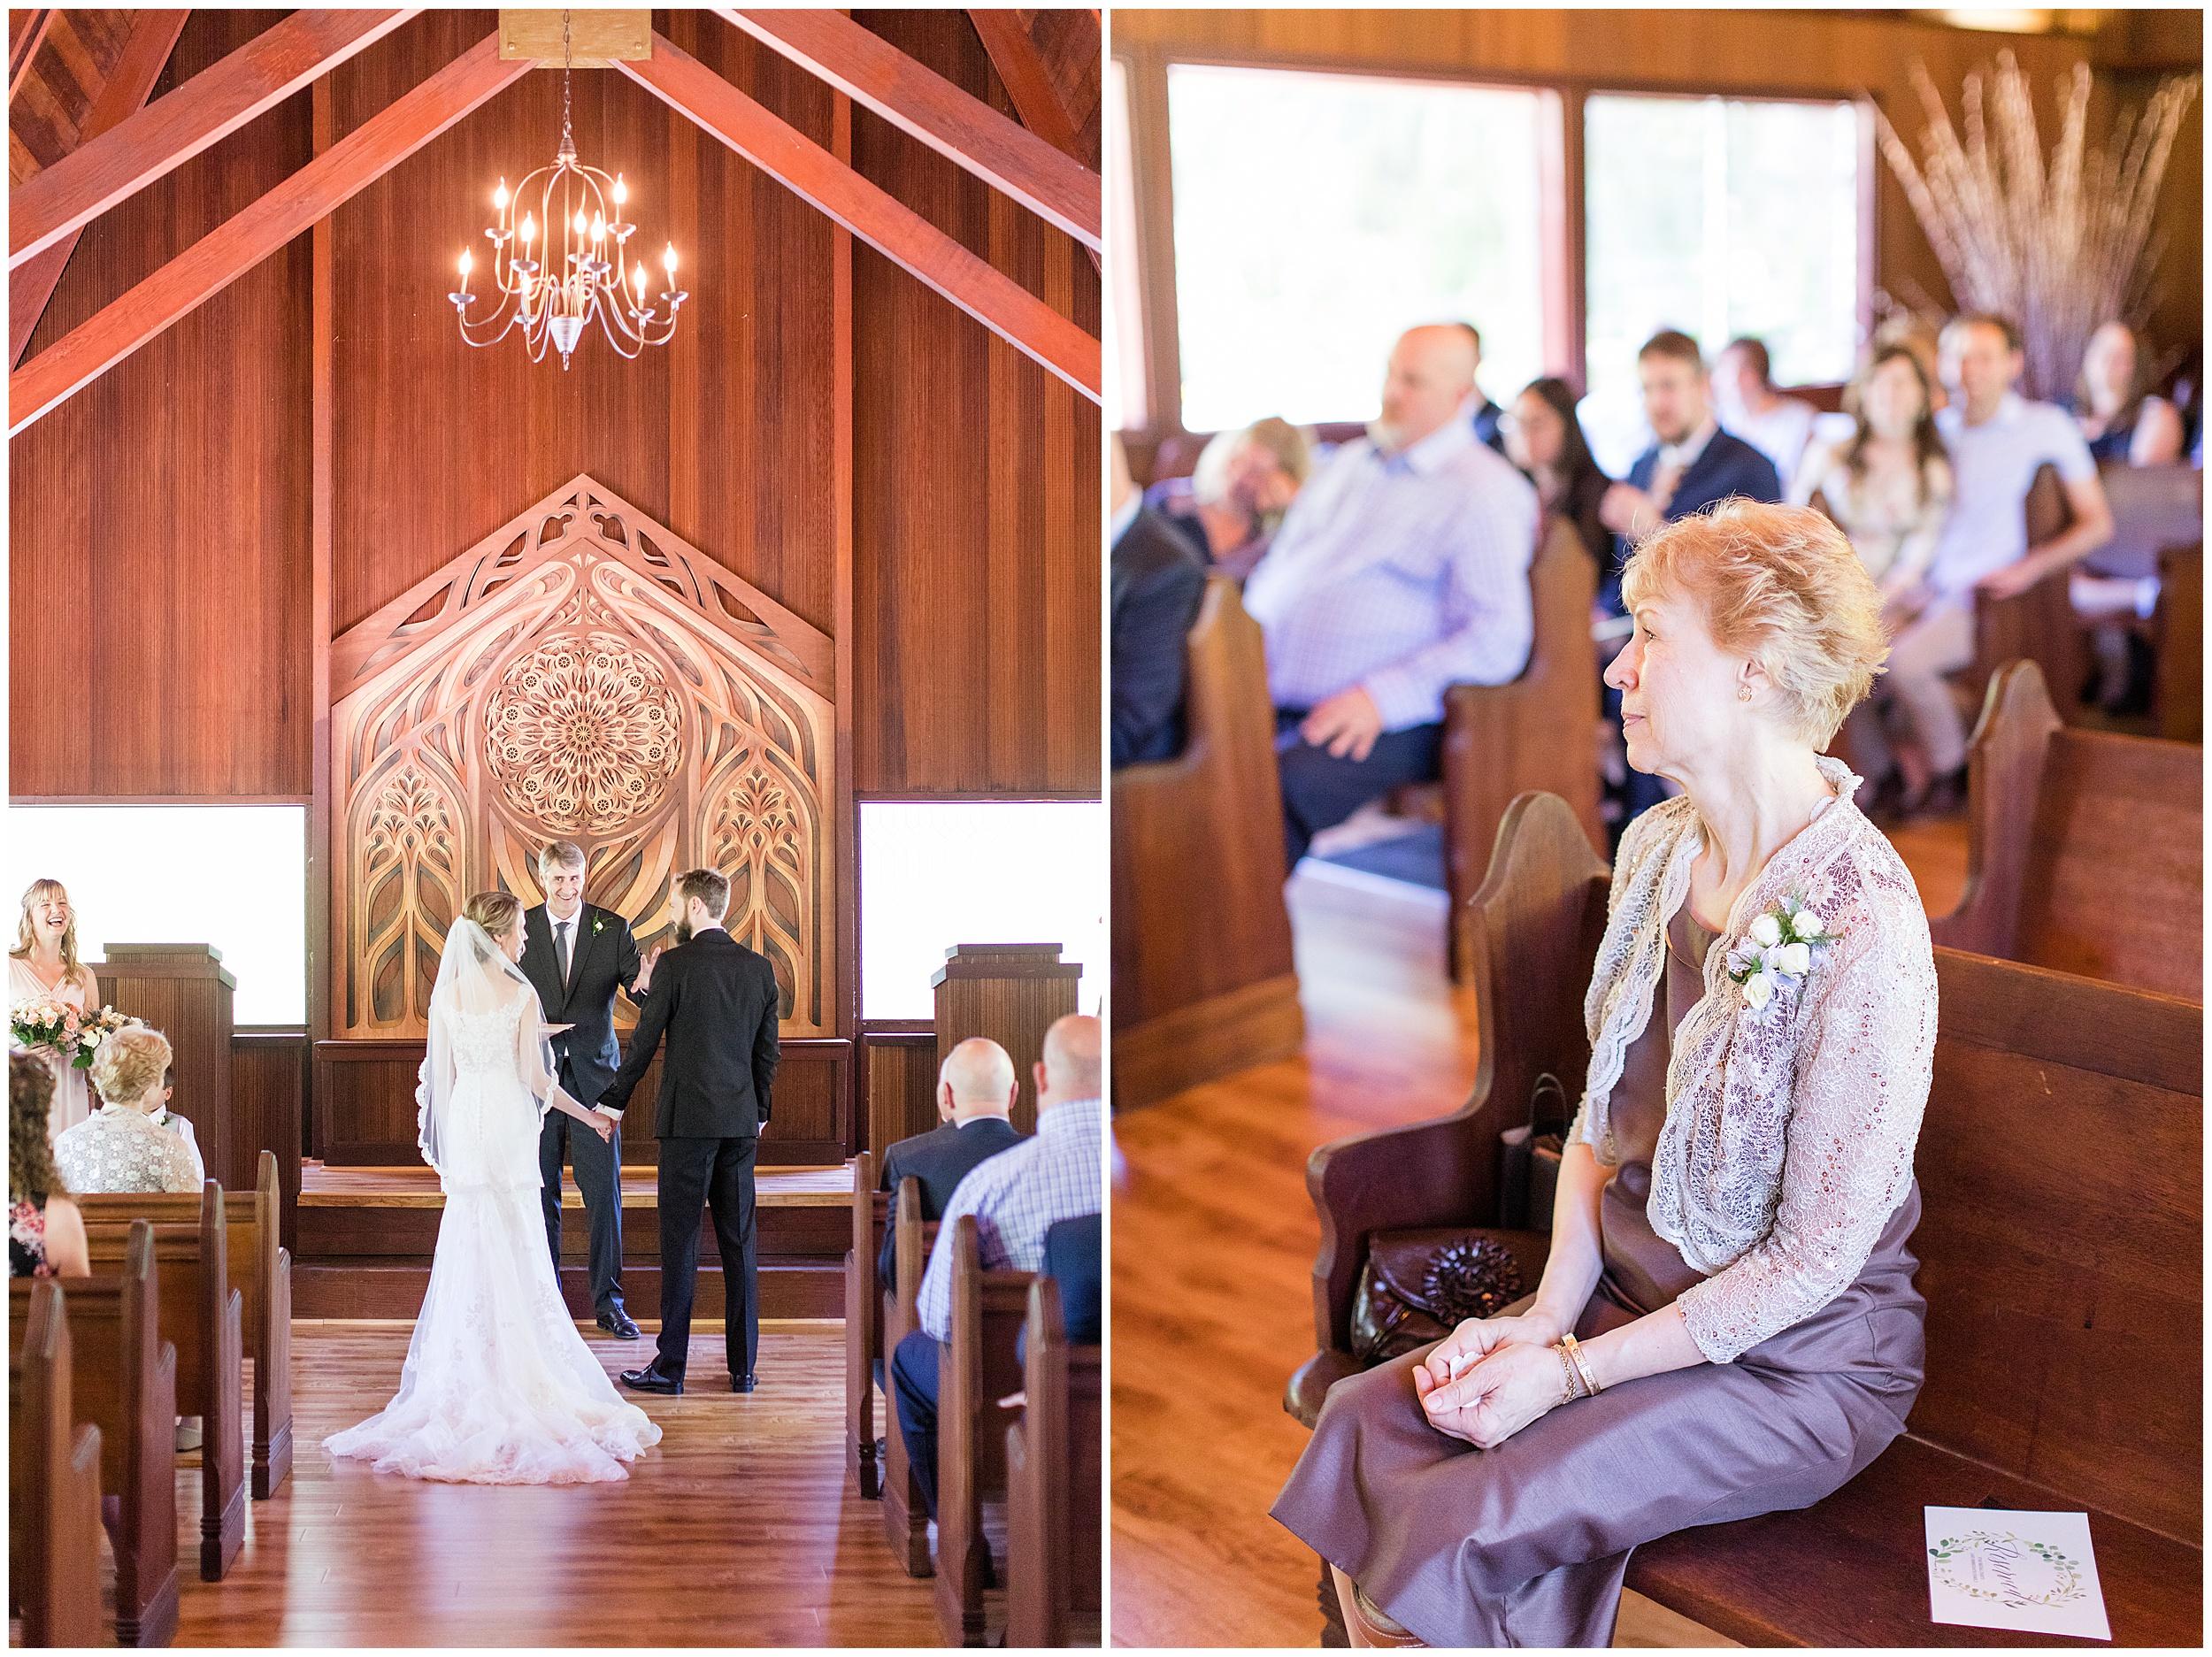 2019 chapel on the hill los gatos san jose bay area wedding photographer angela sue photography_0031.jpg